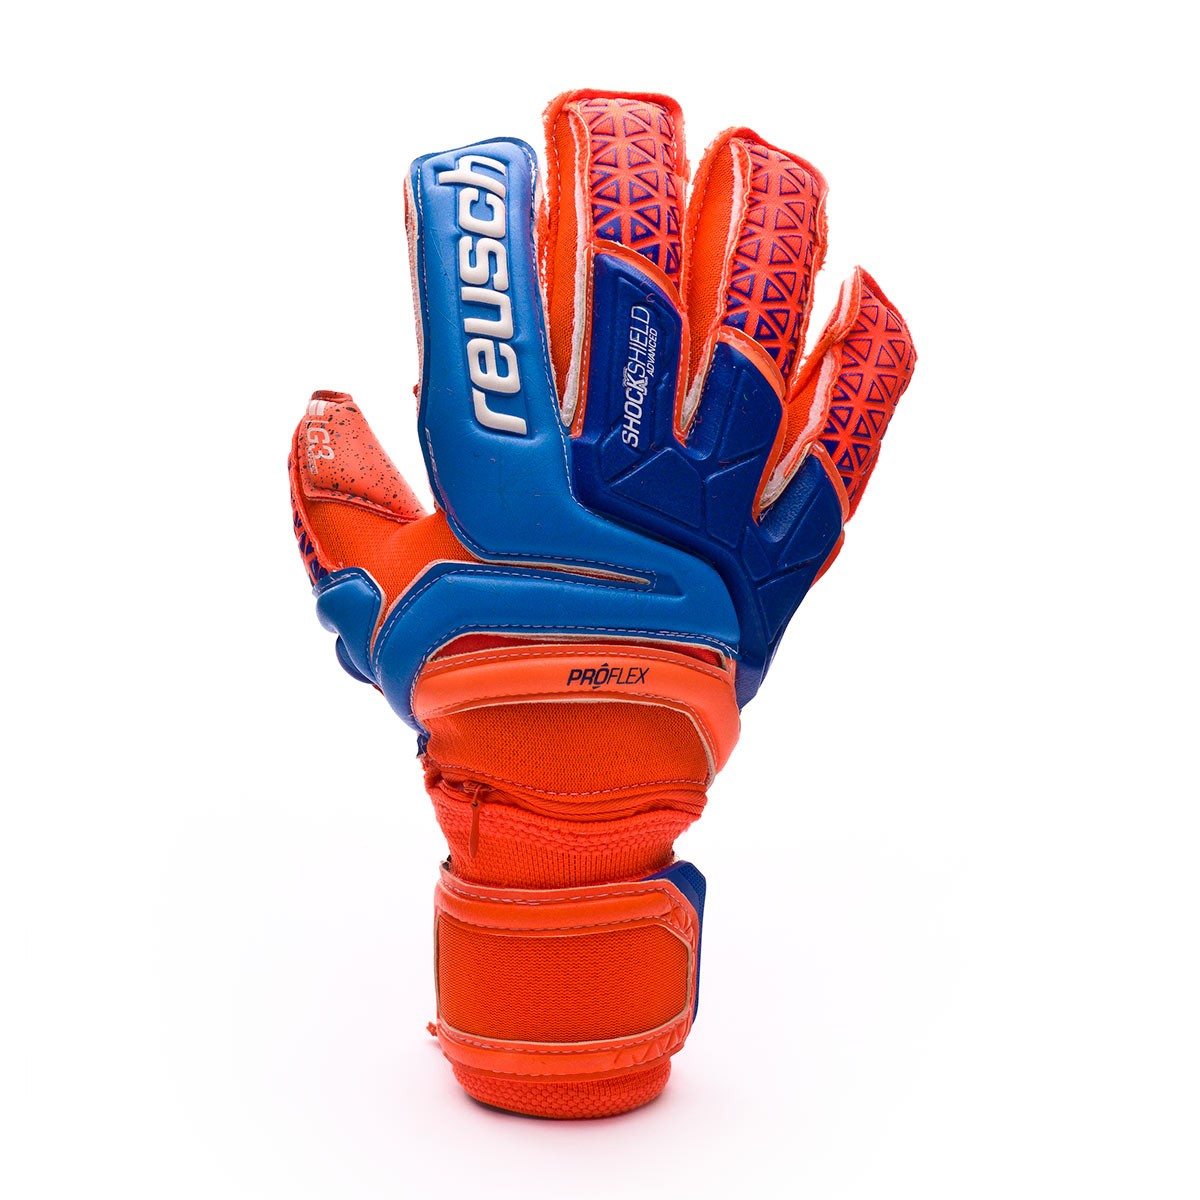 b26347f52 Guanti Reusch Prisma Supreme G3 Fusion Ortho-Tec Shocking  orange-Blue-Shocking orange - Negozio di calcio Fútbol Emotion